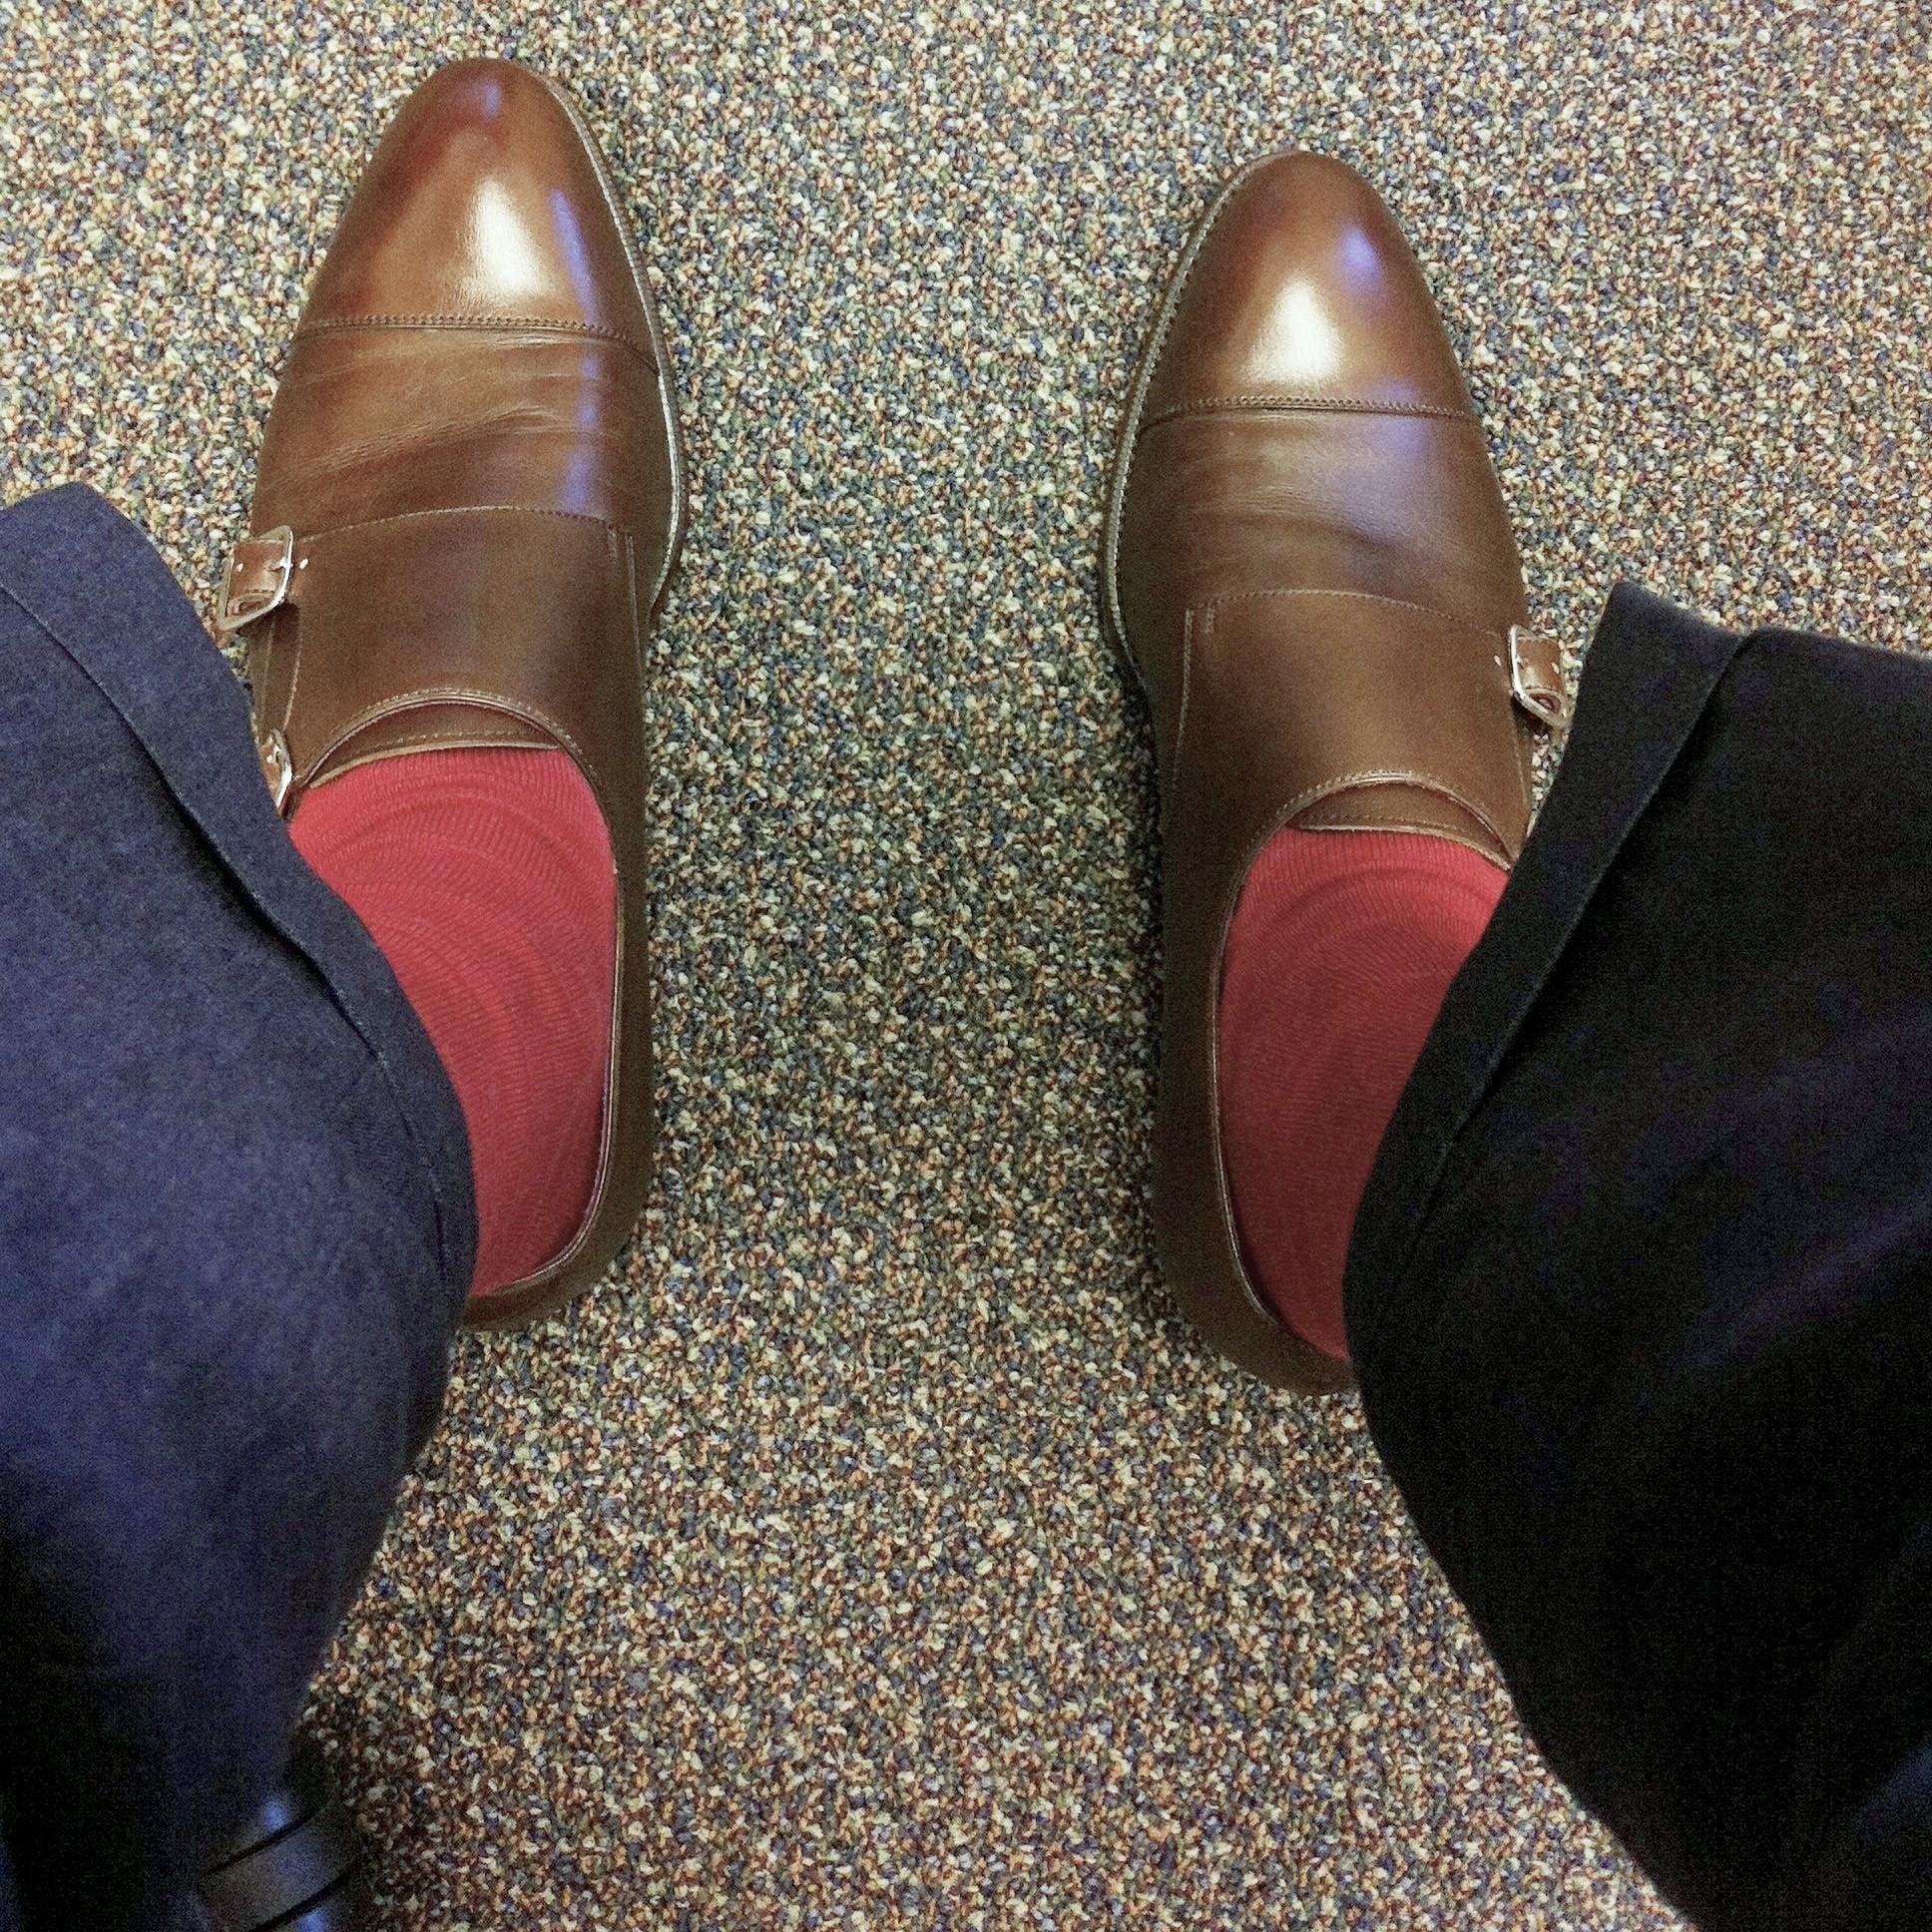 Rocking socks, 5/7/2012